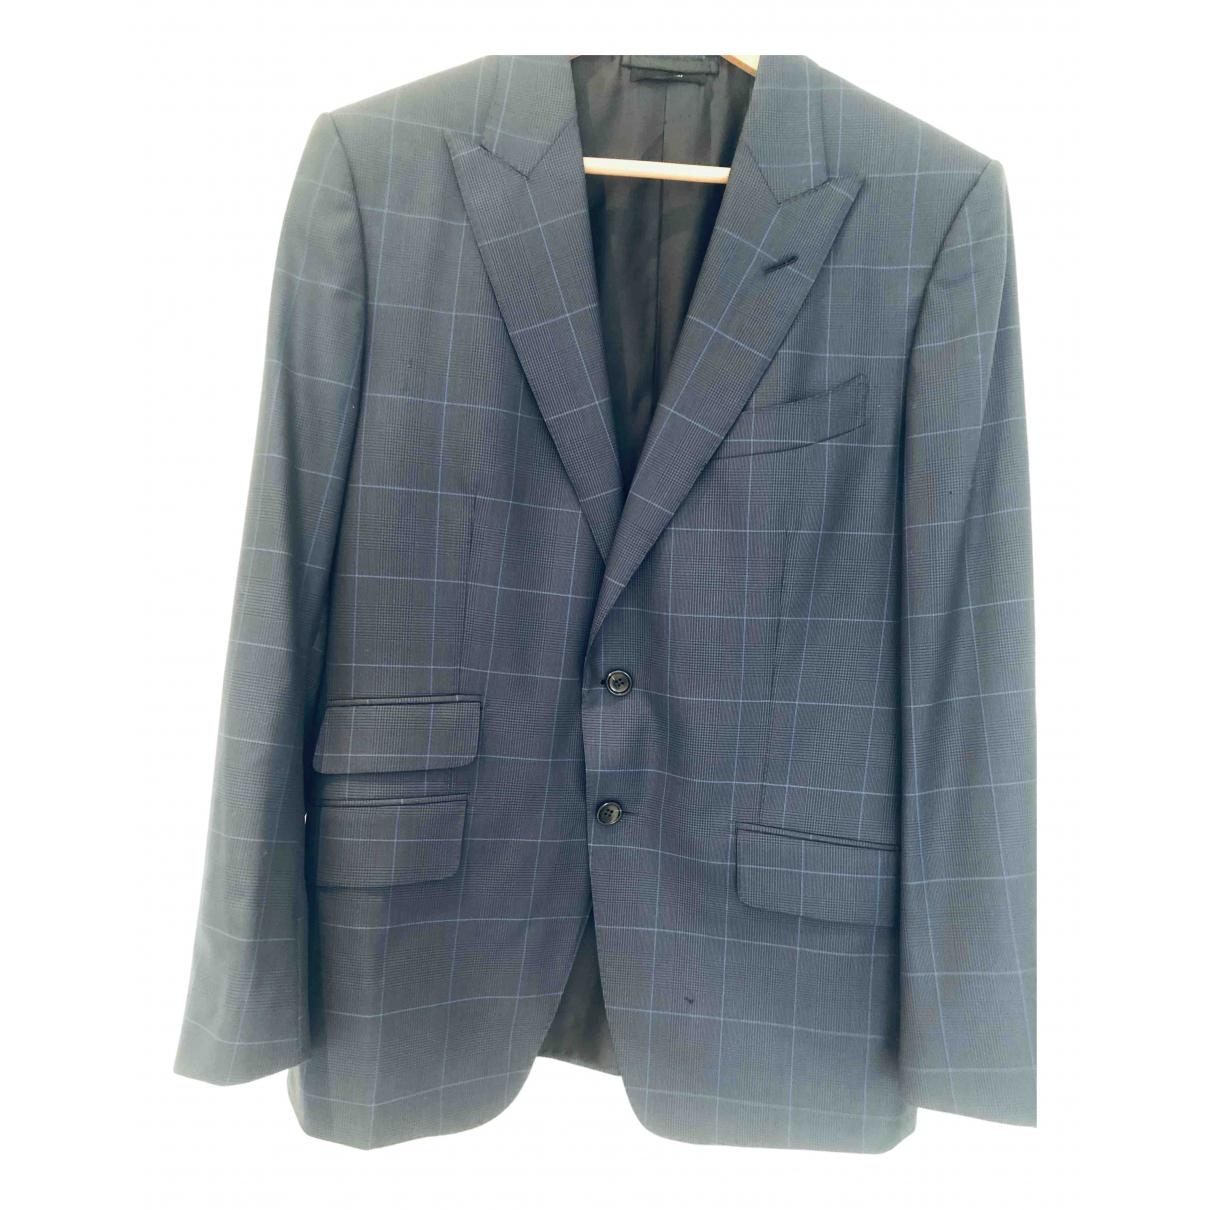 Tom Ford \N Jacke in  Blau Wolle